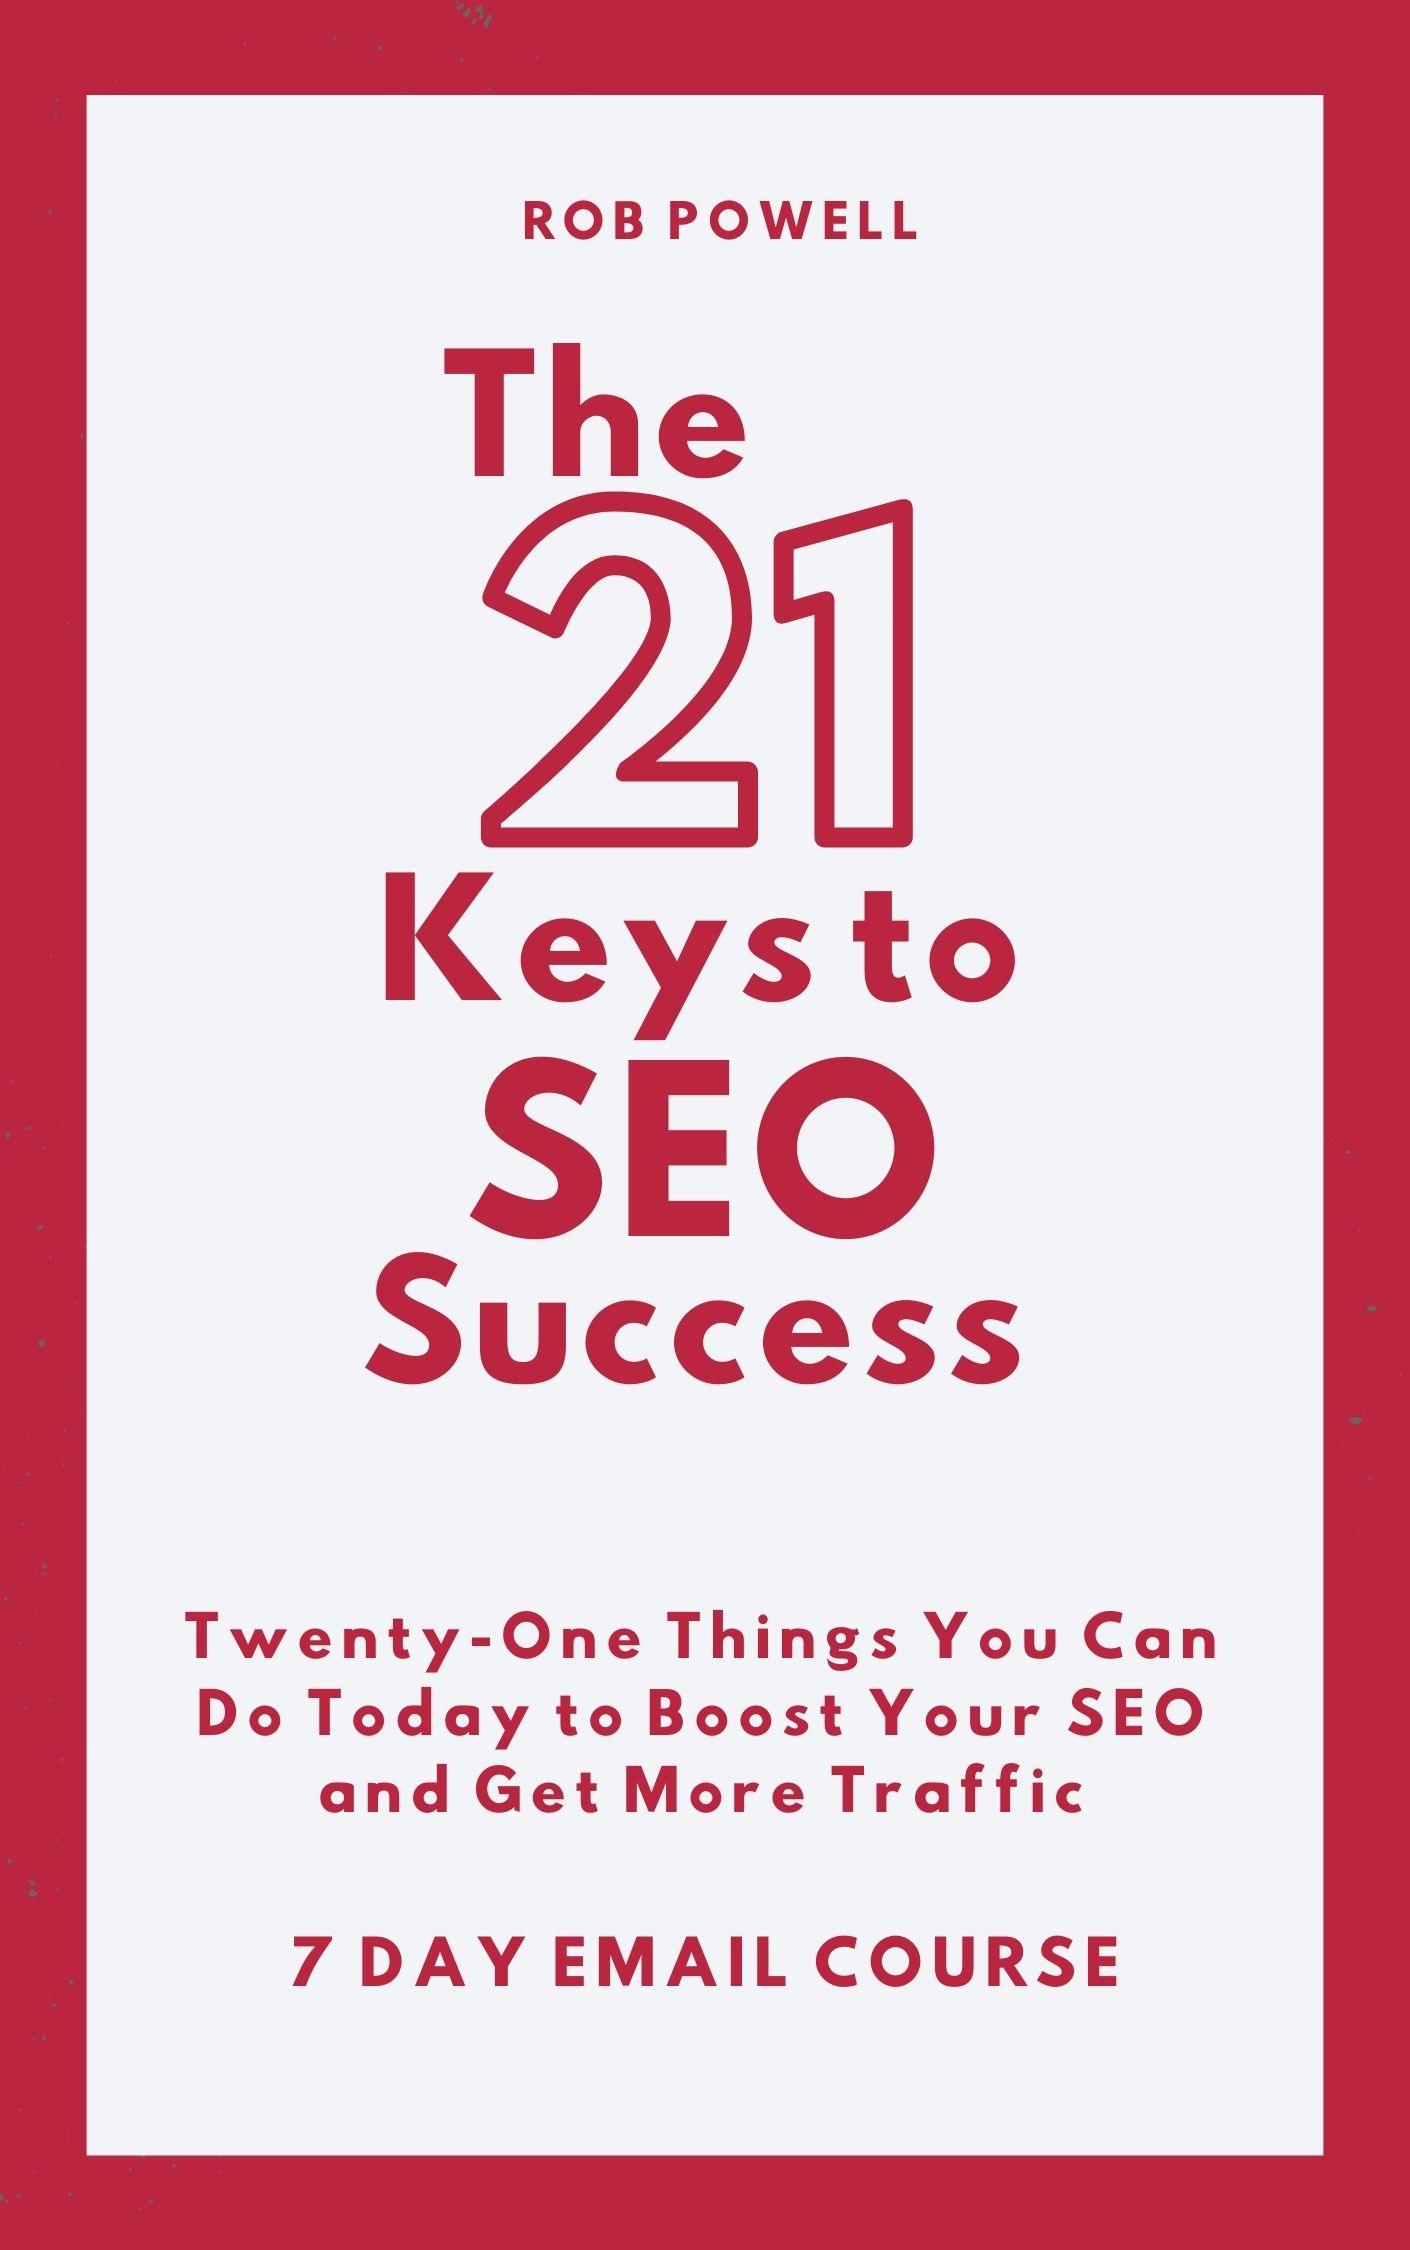 21 keys to SEO success